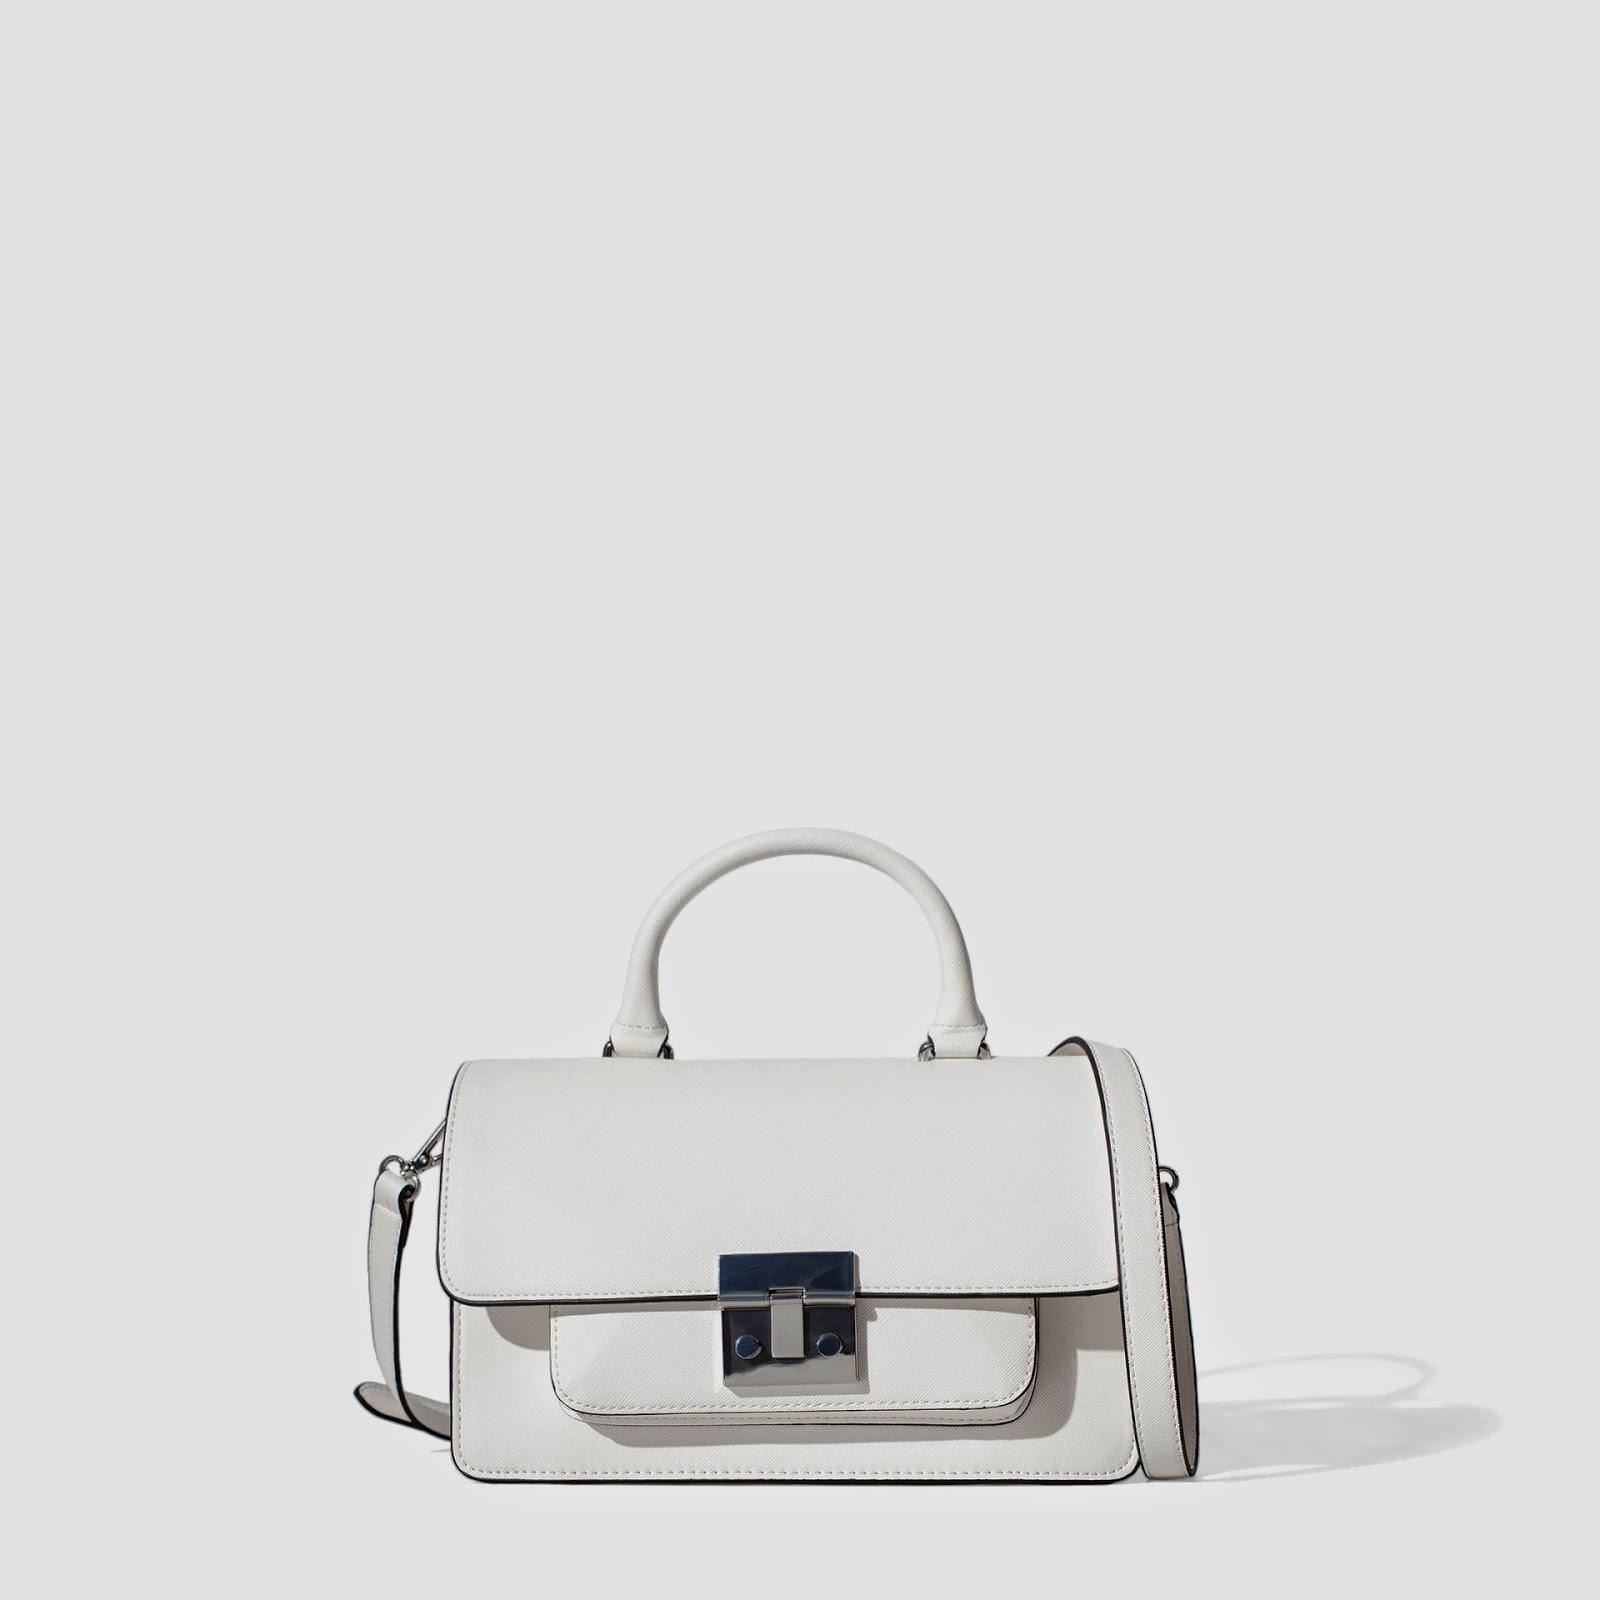 Bandolera/Tote Bag: ZARA